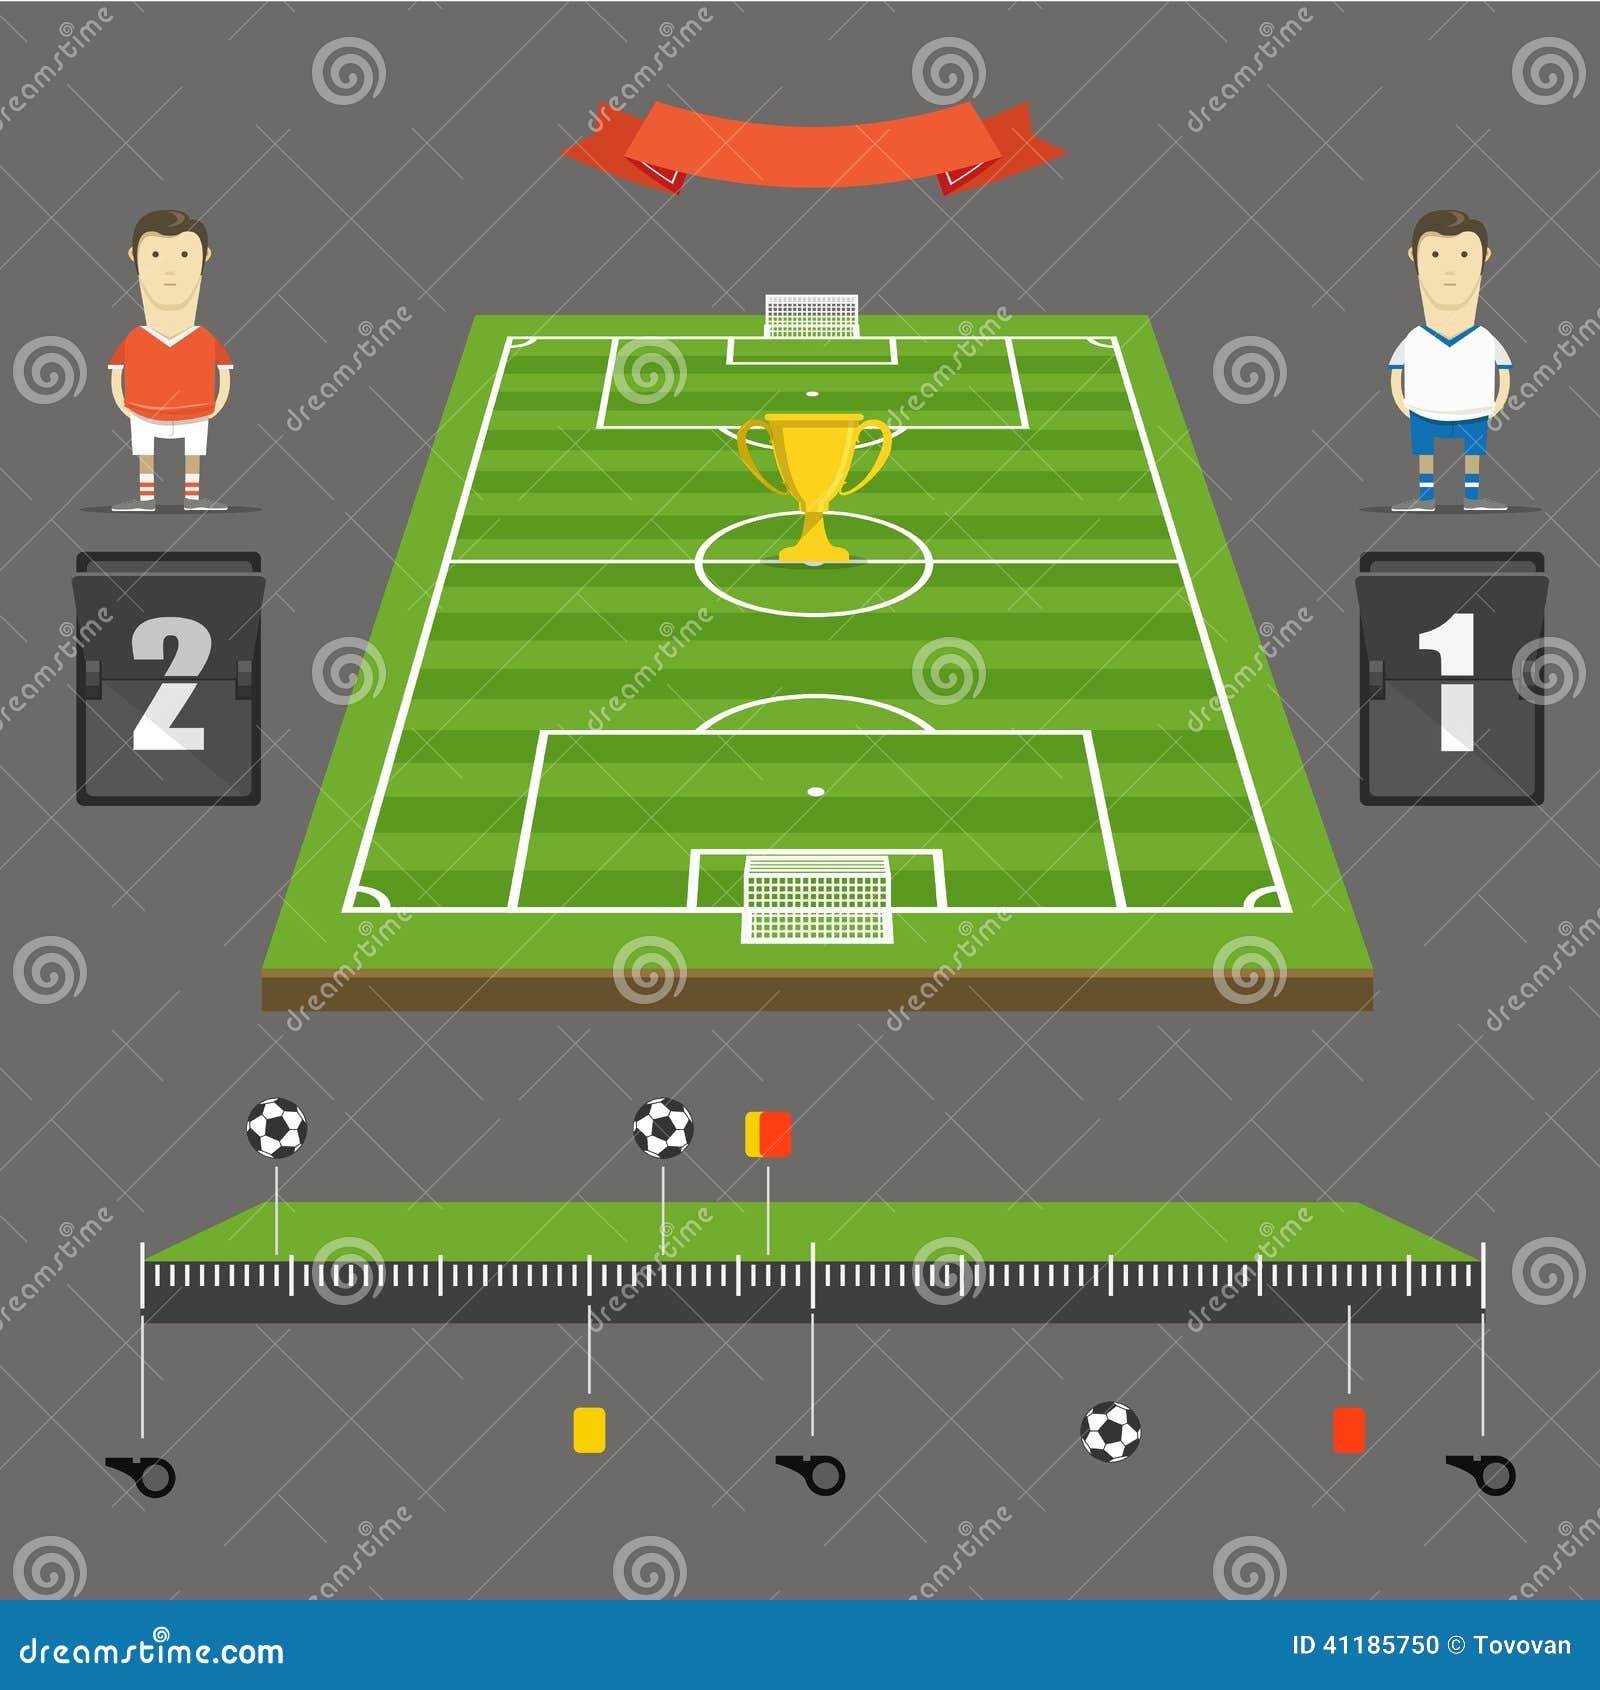 football match statistics